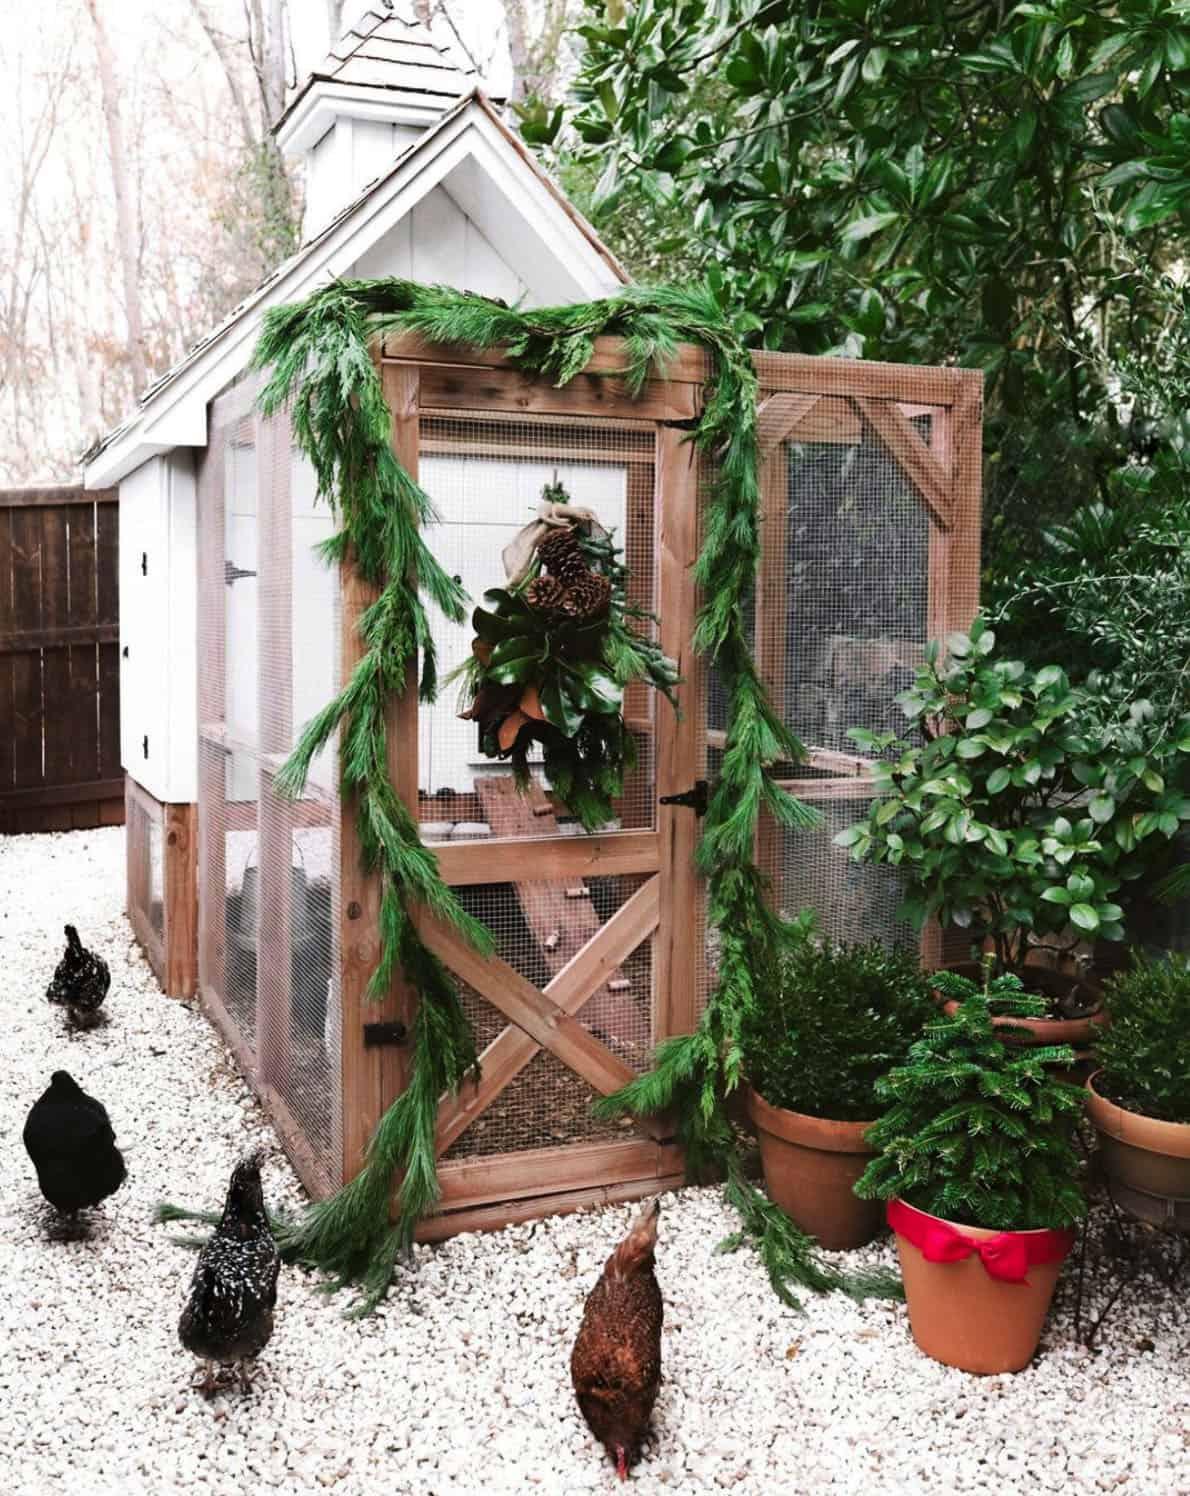 holiday-decor-ideas-festive-chicken-coop